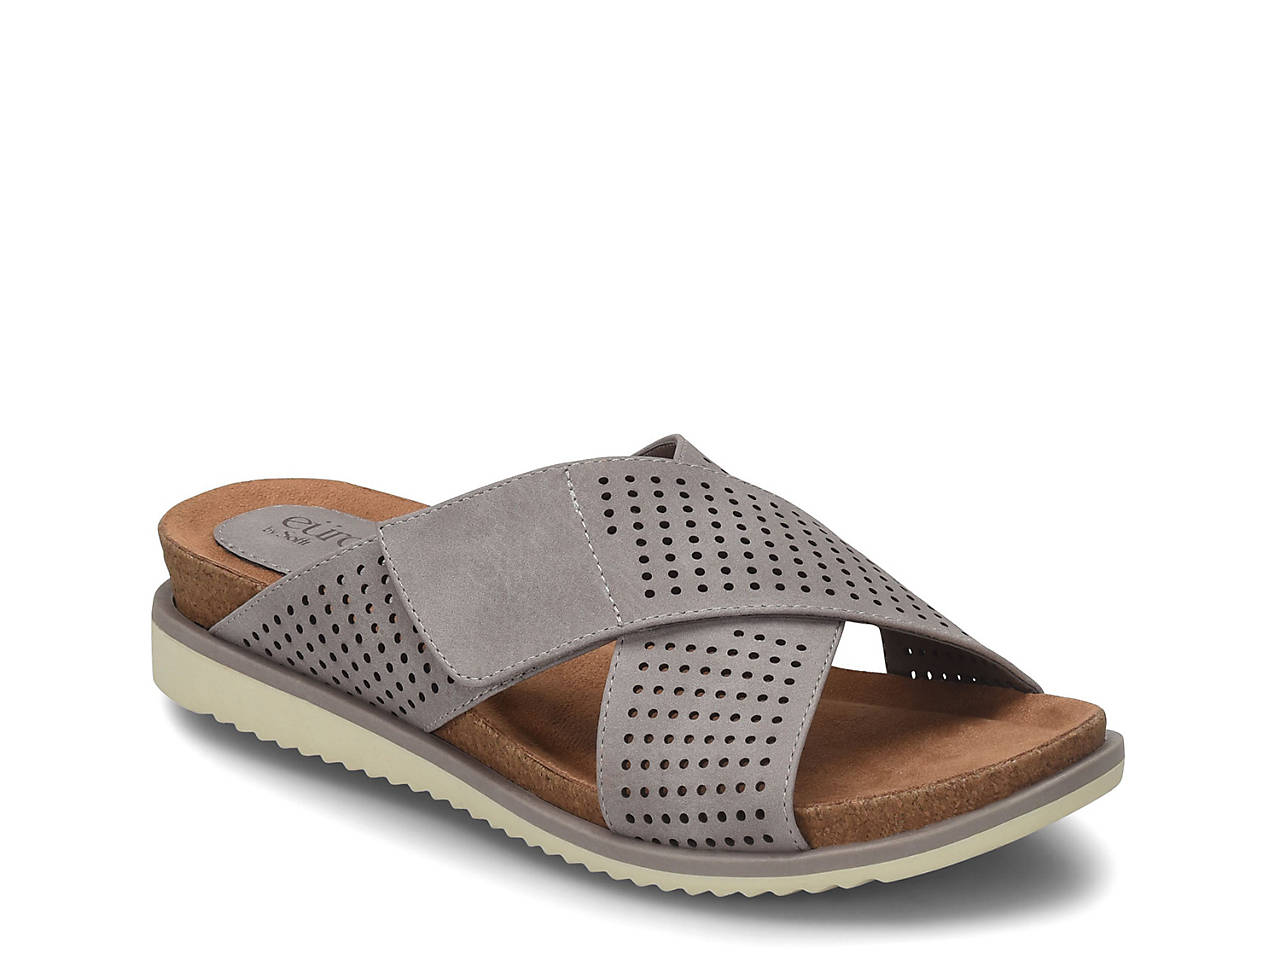 e5a5dc8b6609 Eurosoft Lisbet Wedge Sandal Women s Shoes